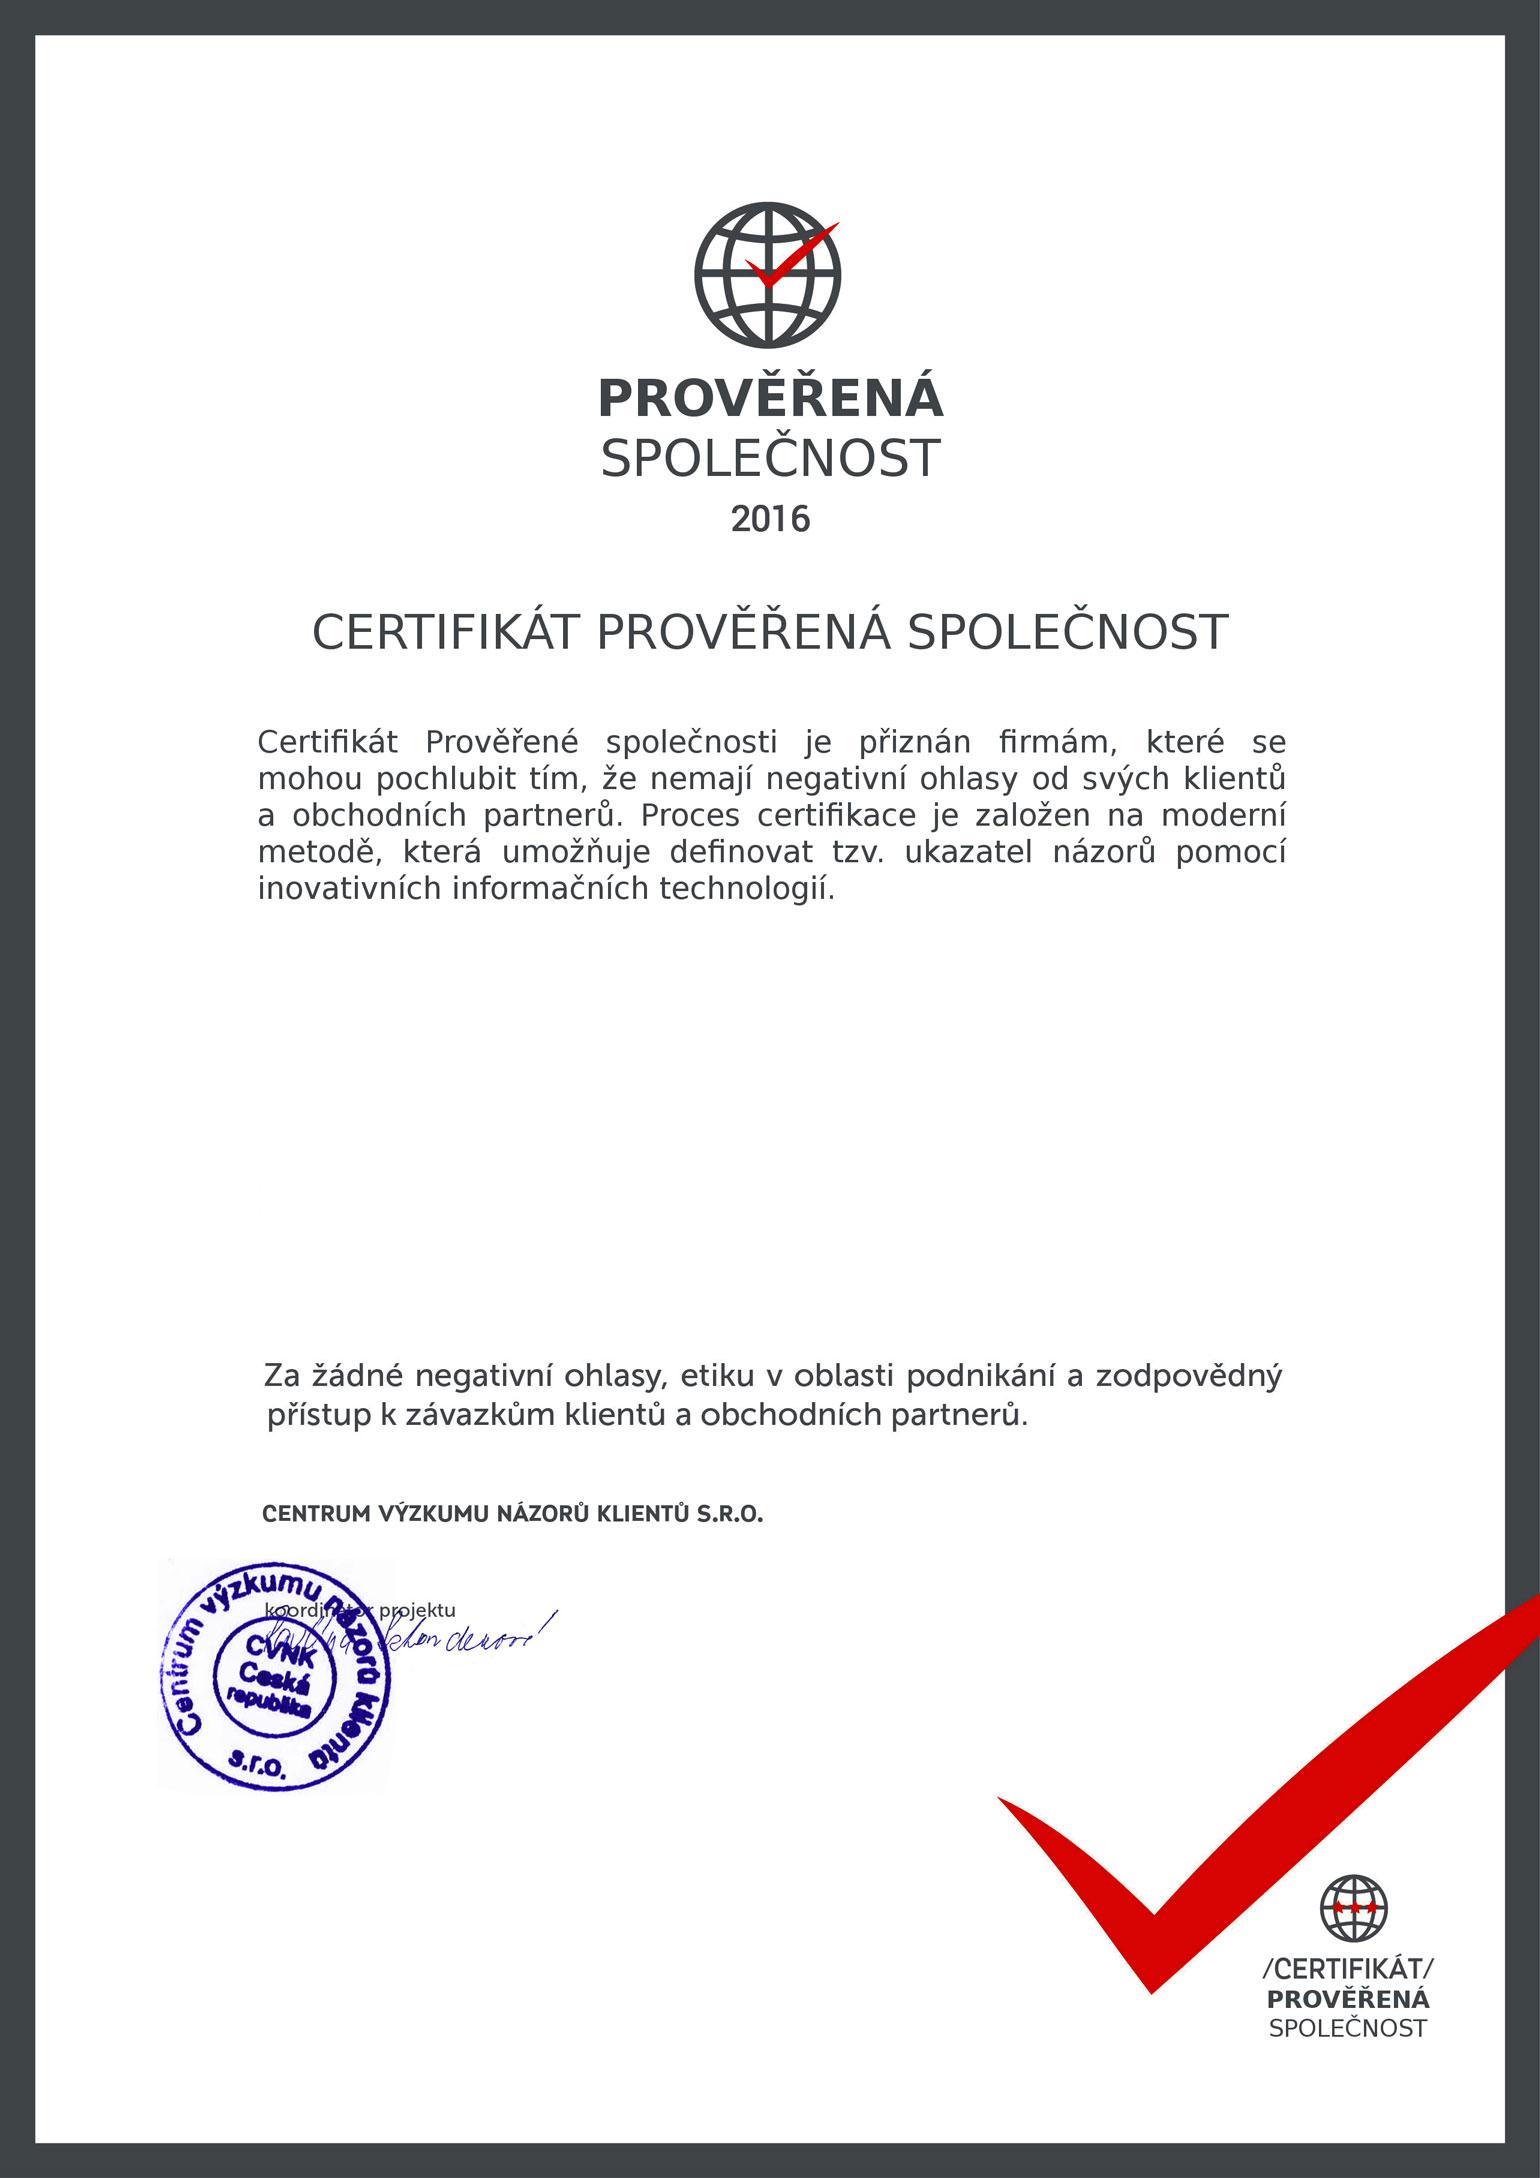 uprava_proverena-spolecnost